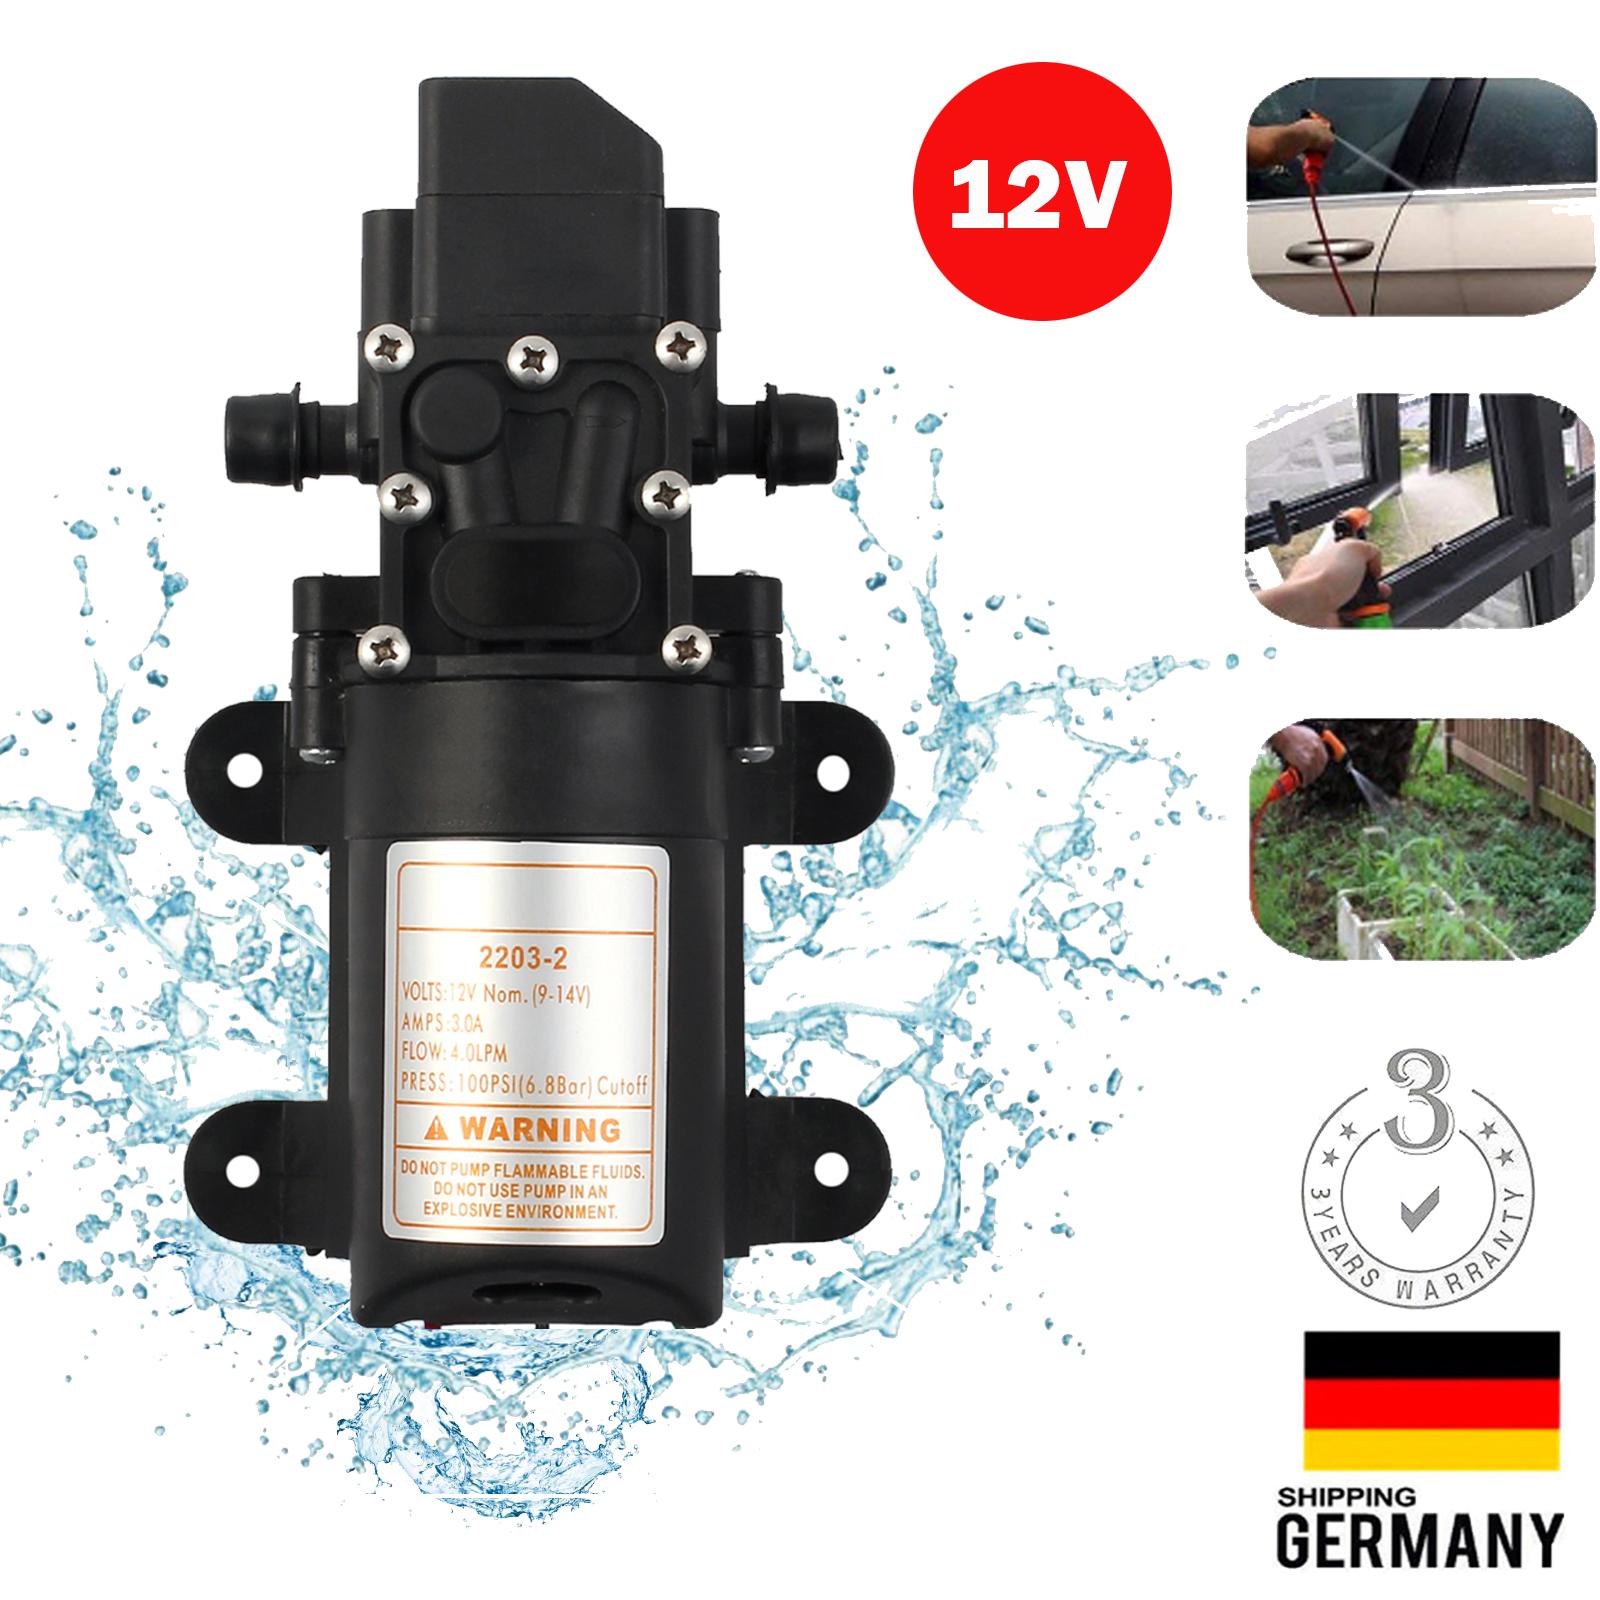 Druckwasserpumpe Hochdruck Wasserpumpe Membranpumpe Pumpe fr Auto Boot Garten DE